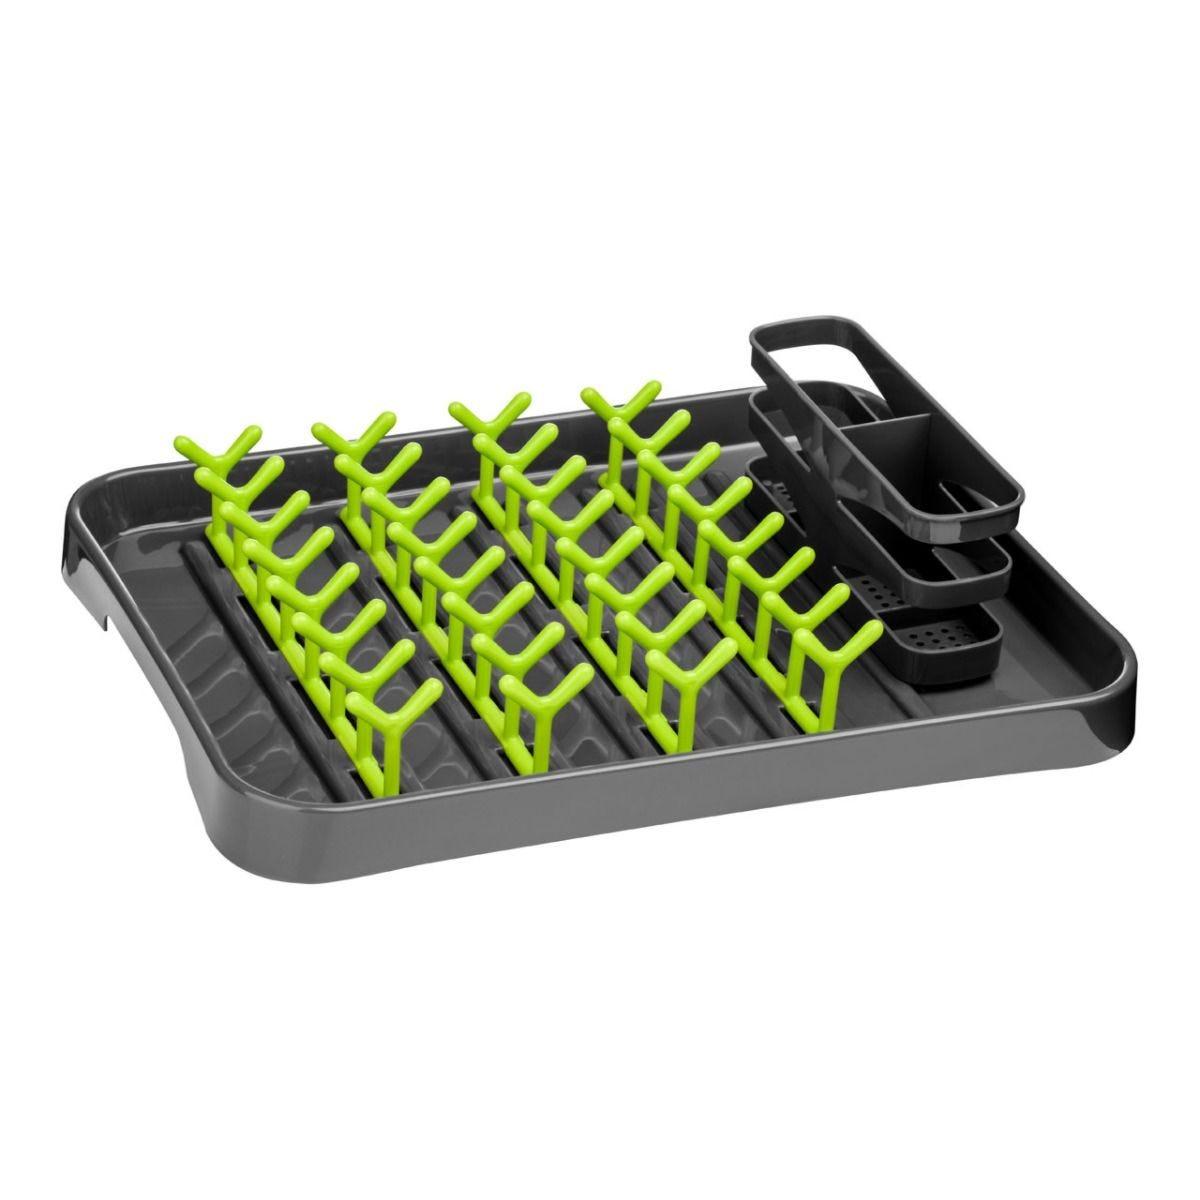 Premier Housewares Dish Drainer - Lime Green